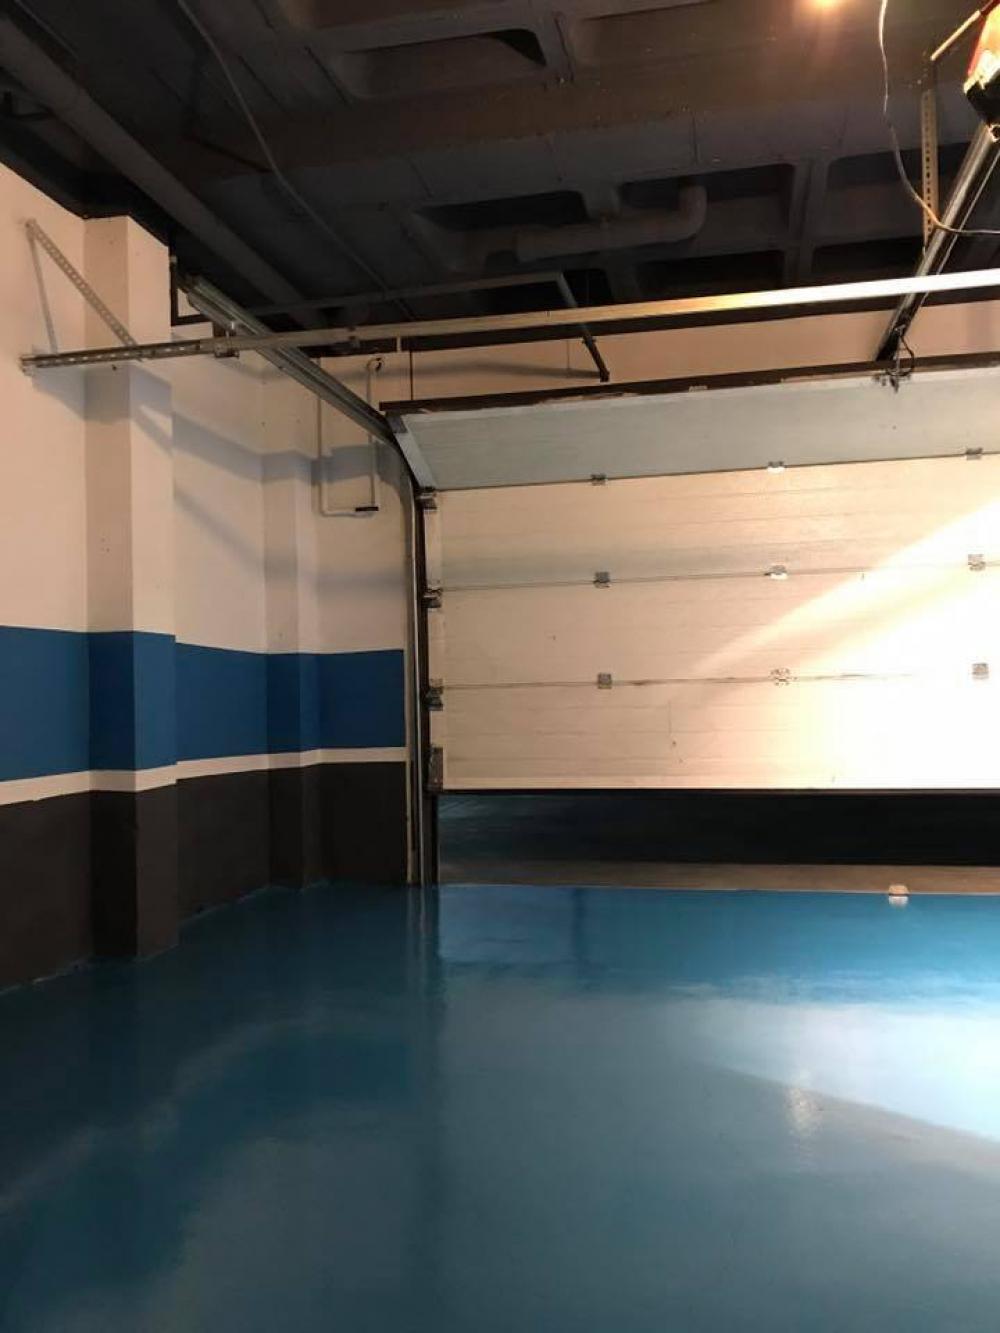 Stucco 57 Pintores Profesionales En Alicante Pintar Hoteles En